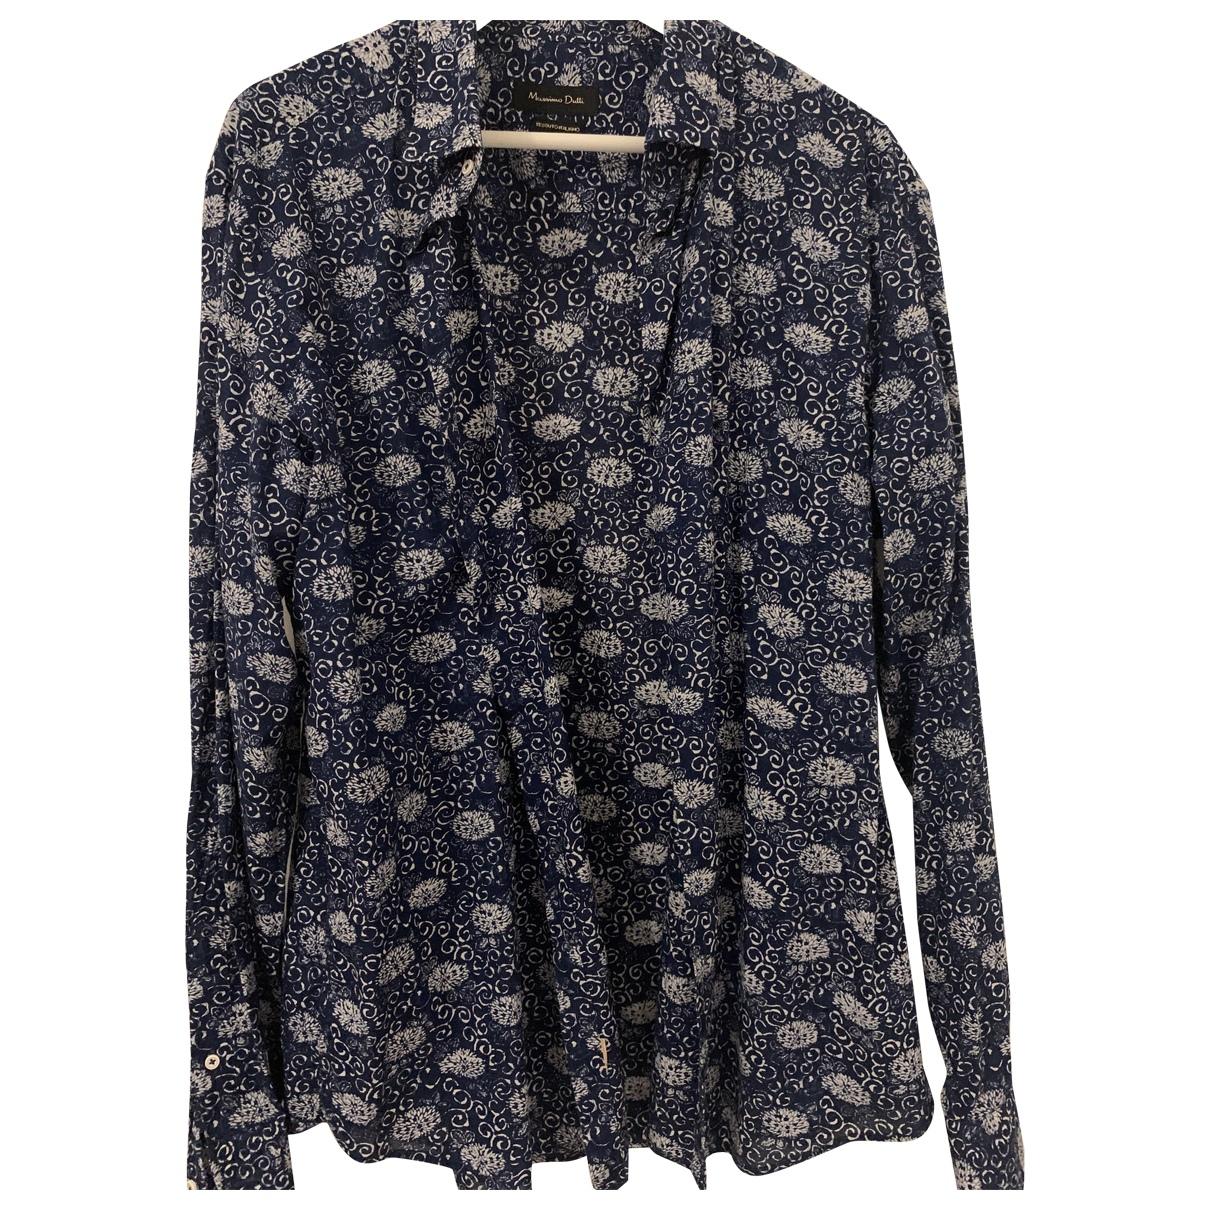 Massimo Dutti \N Blue Cotton Shirts for Men XXL International